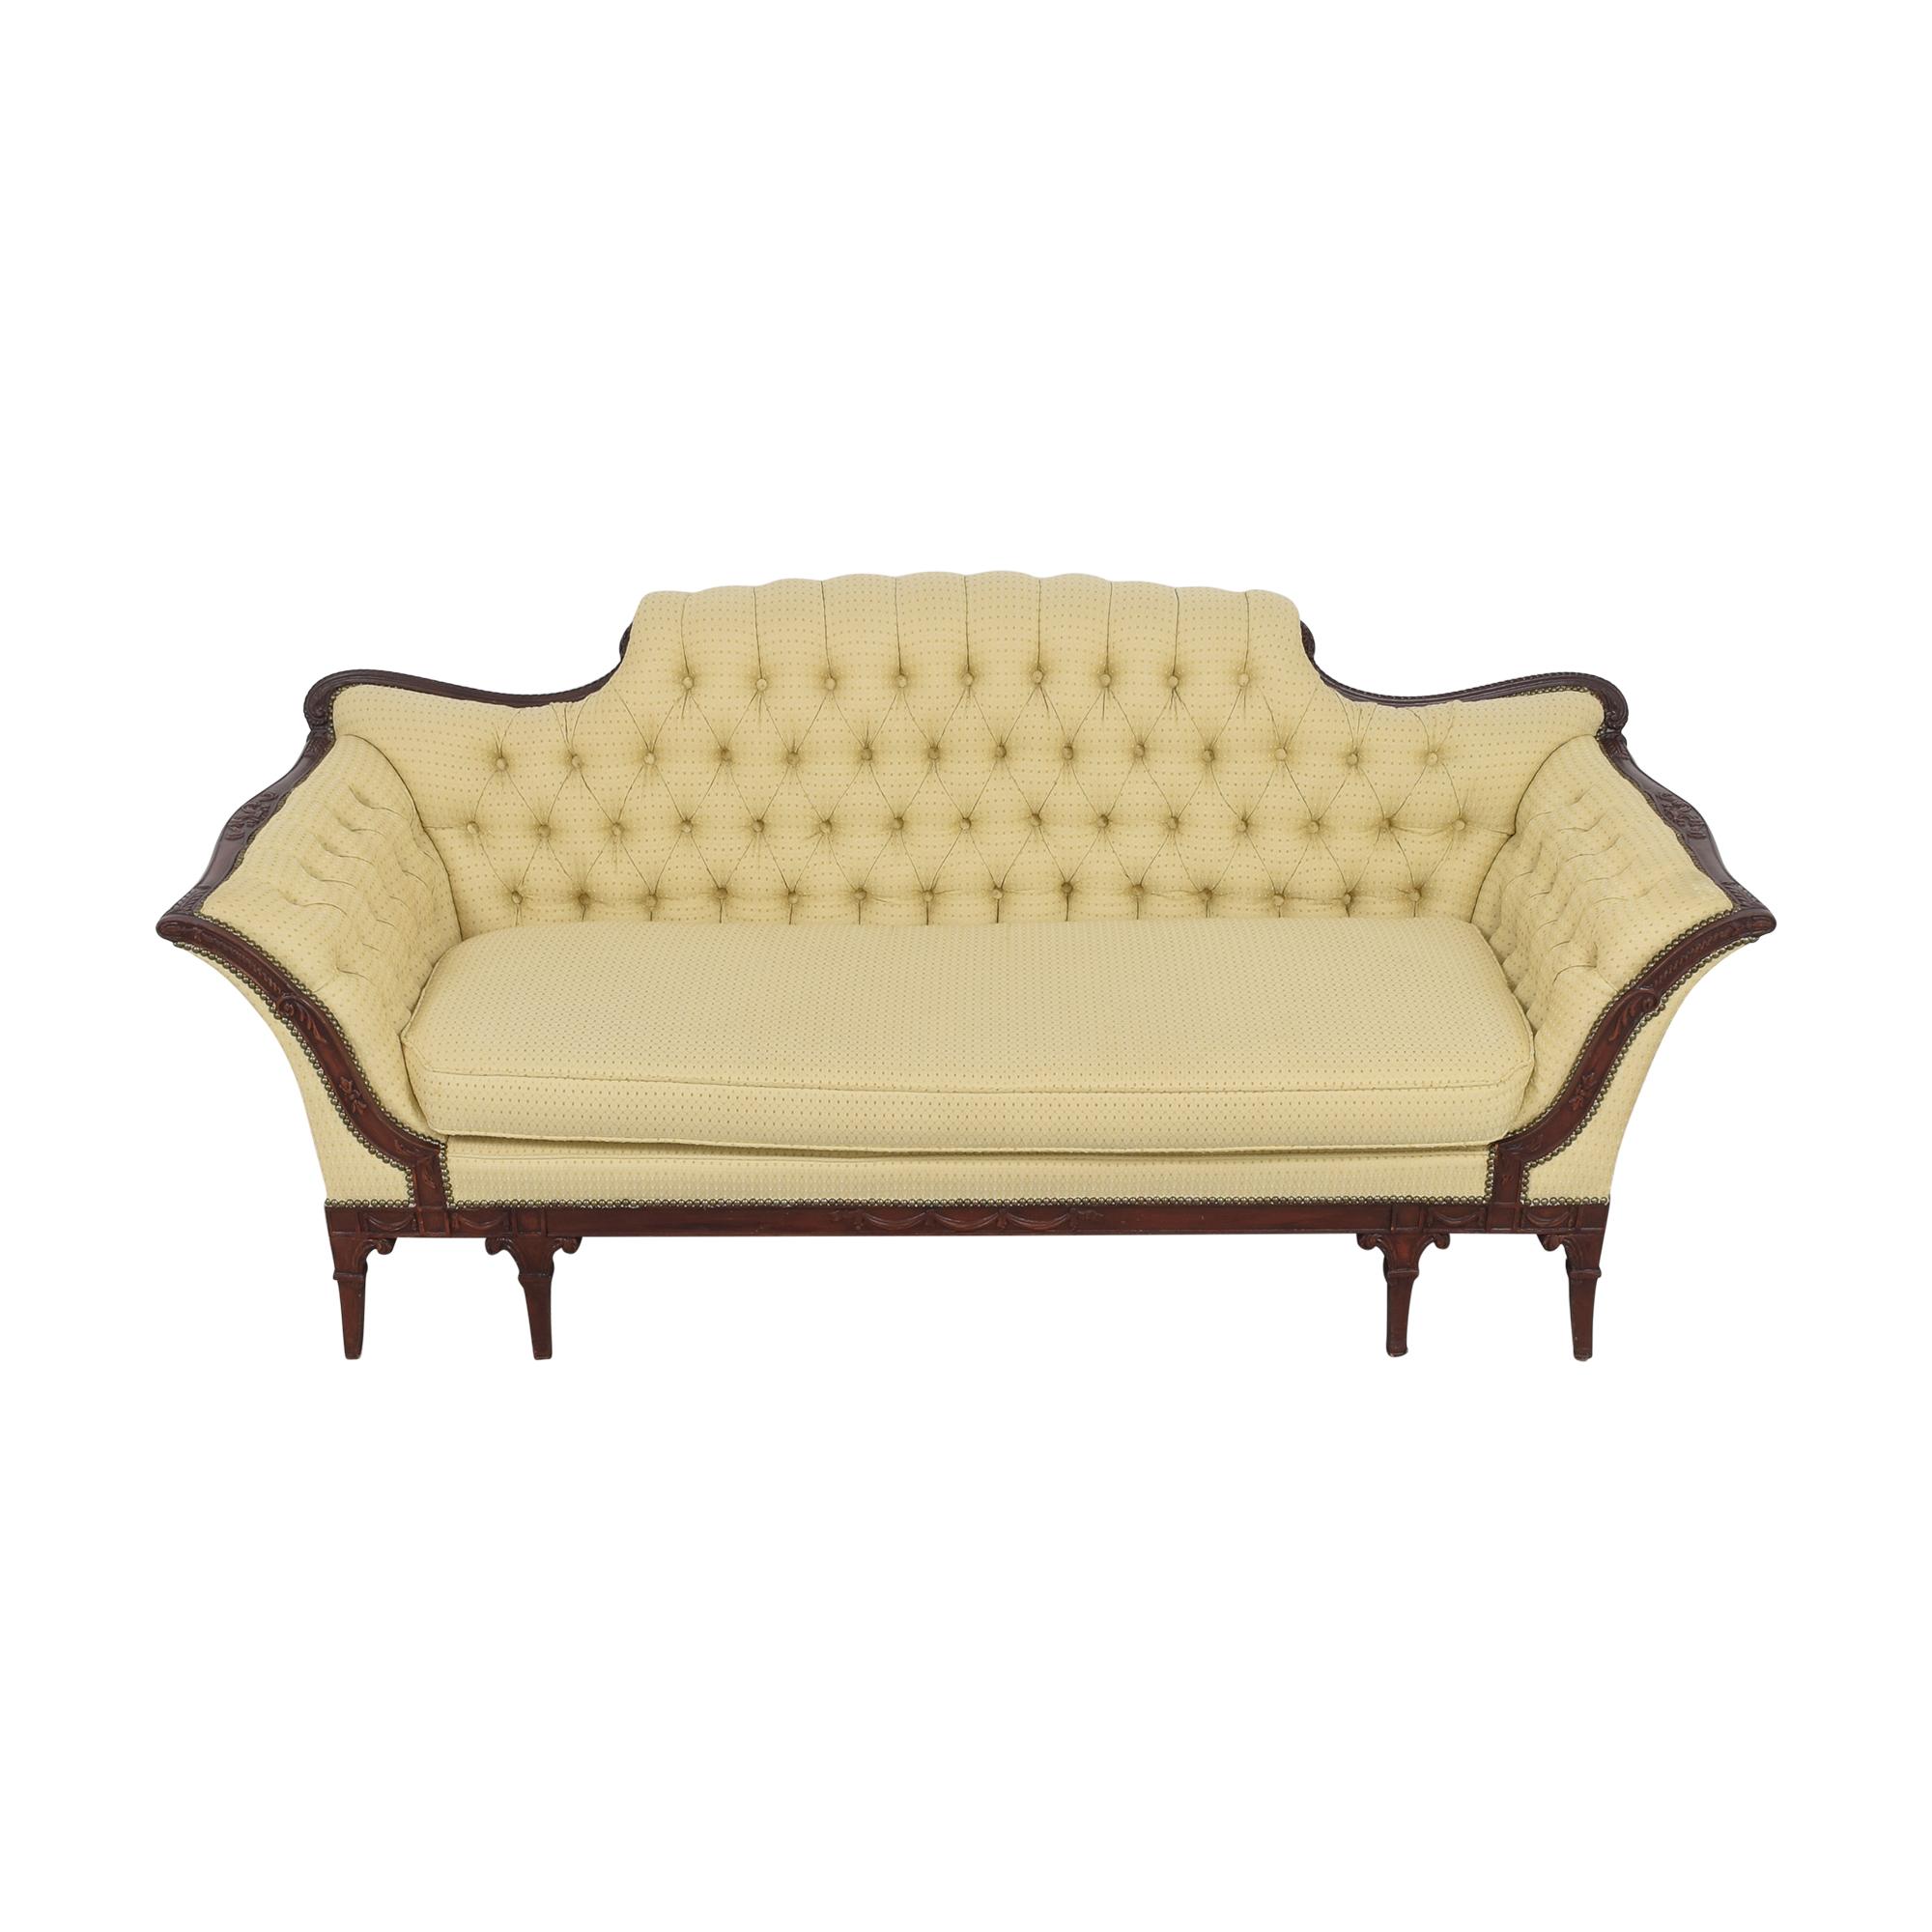 Vintage Tufted Camelback Sofa coupon